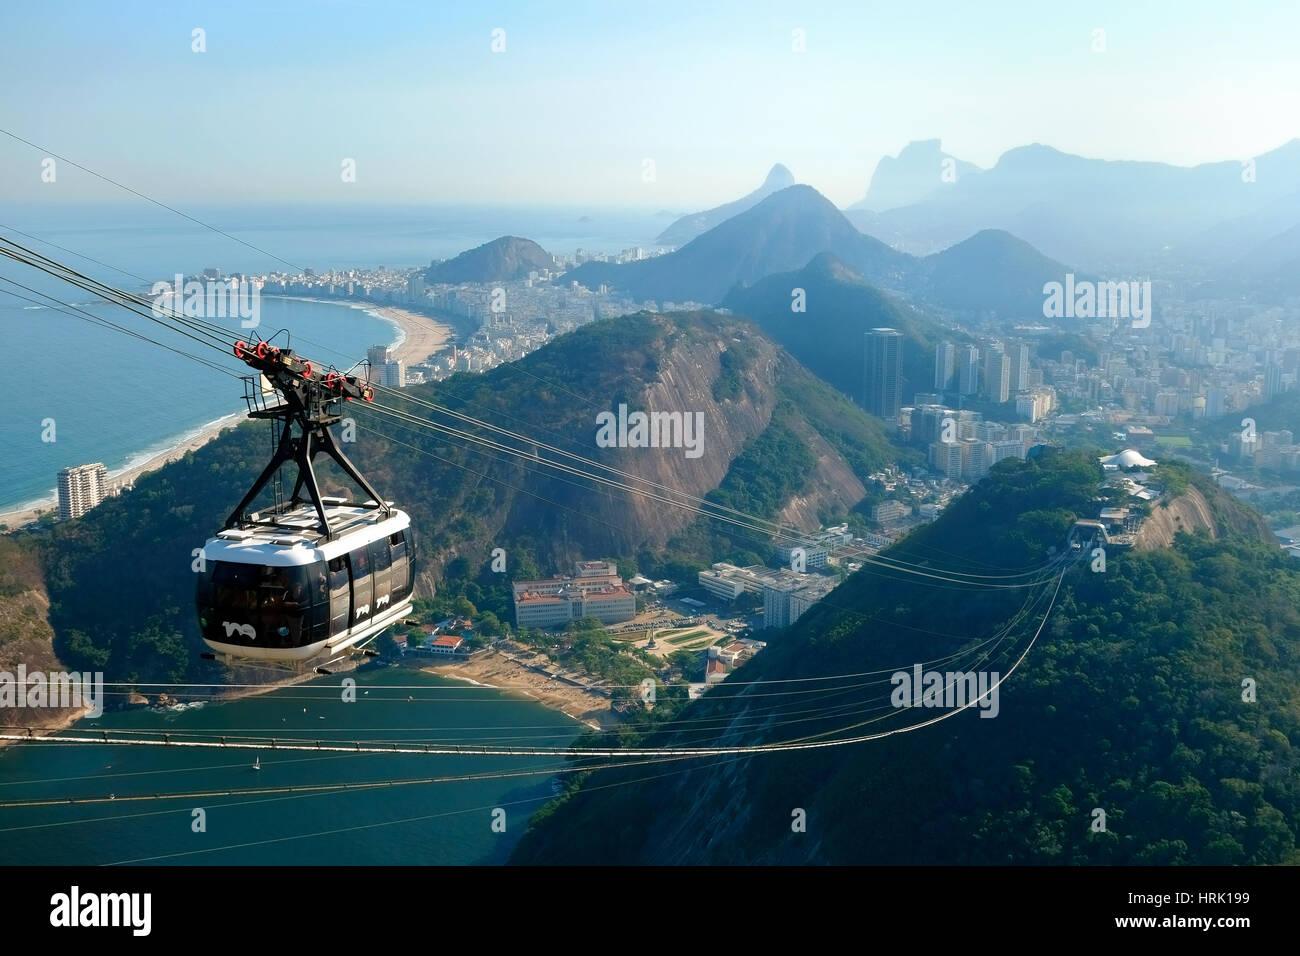 Cableway to the Sugarloaf Mountain, at back Copacabana, Rio de Janeiro, Brazil Stock Photo